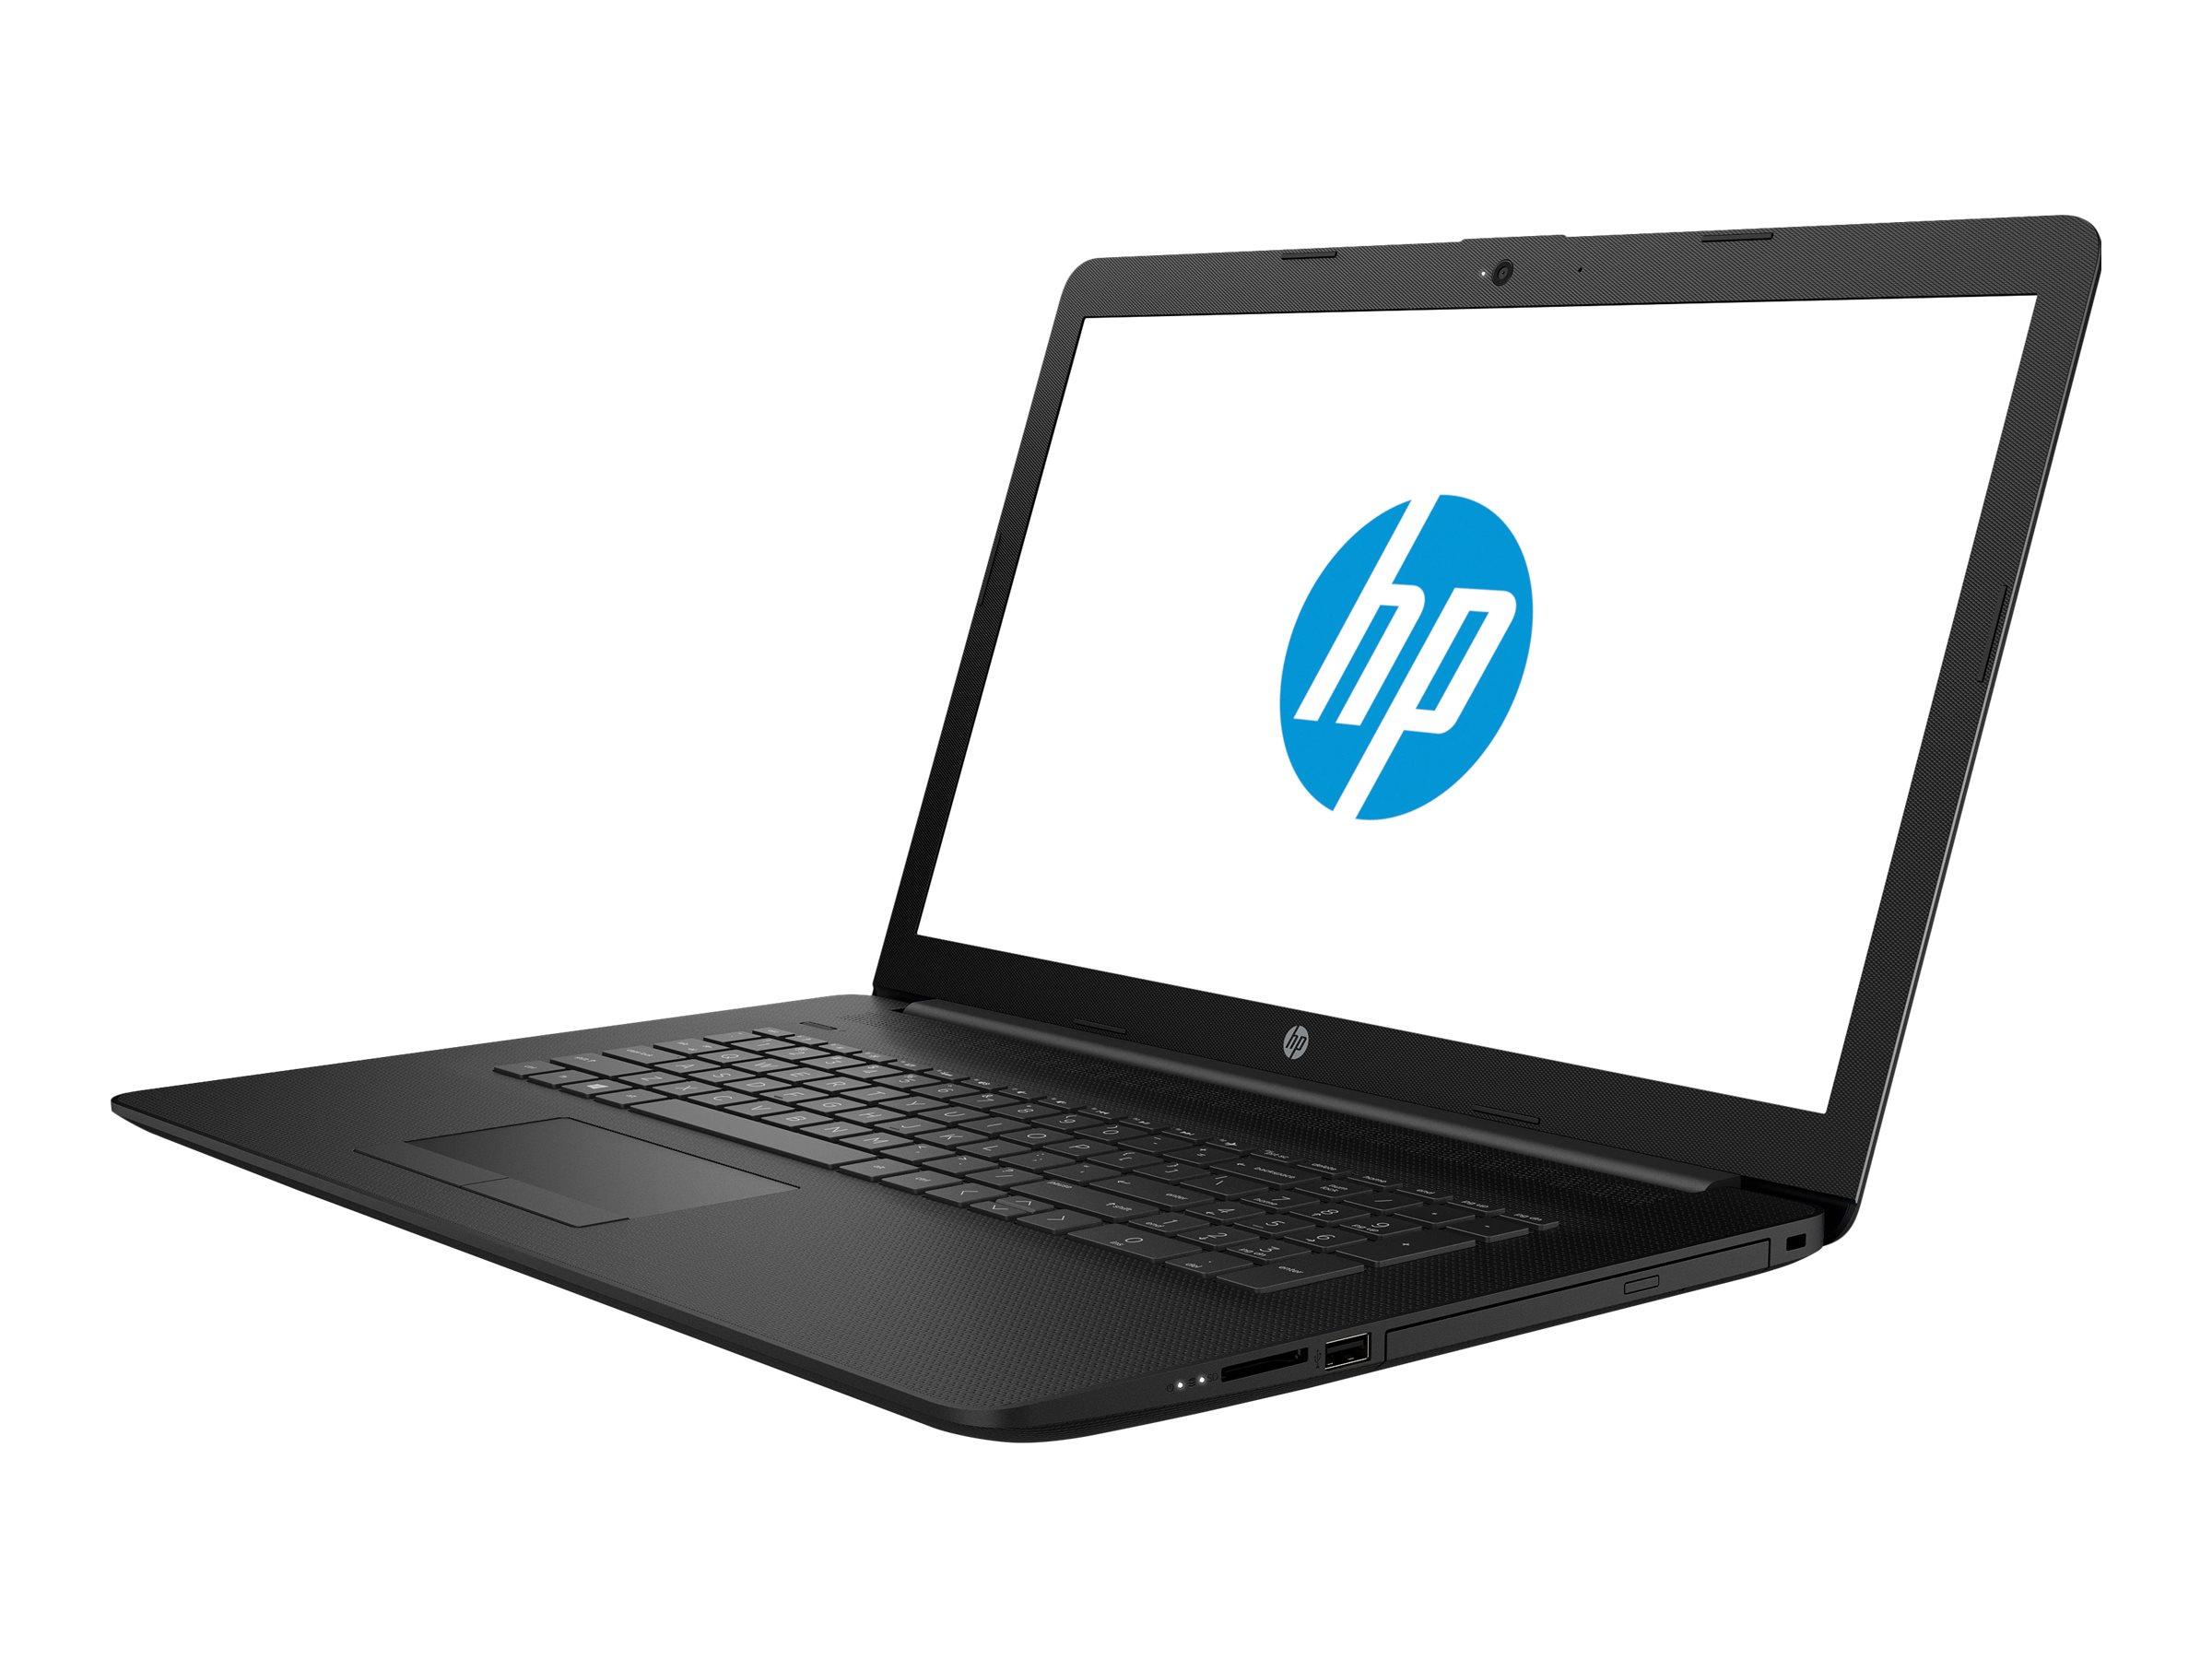 HP 17-by0104ng Schwarz Notebook 43,9 cm (17.3 Zoll) 1600 x 900 Pixel 1,10 GHz Intel? Celeron? N4000